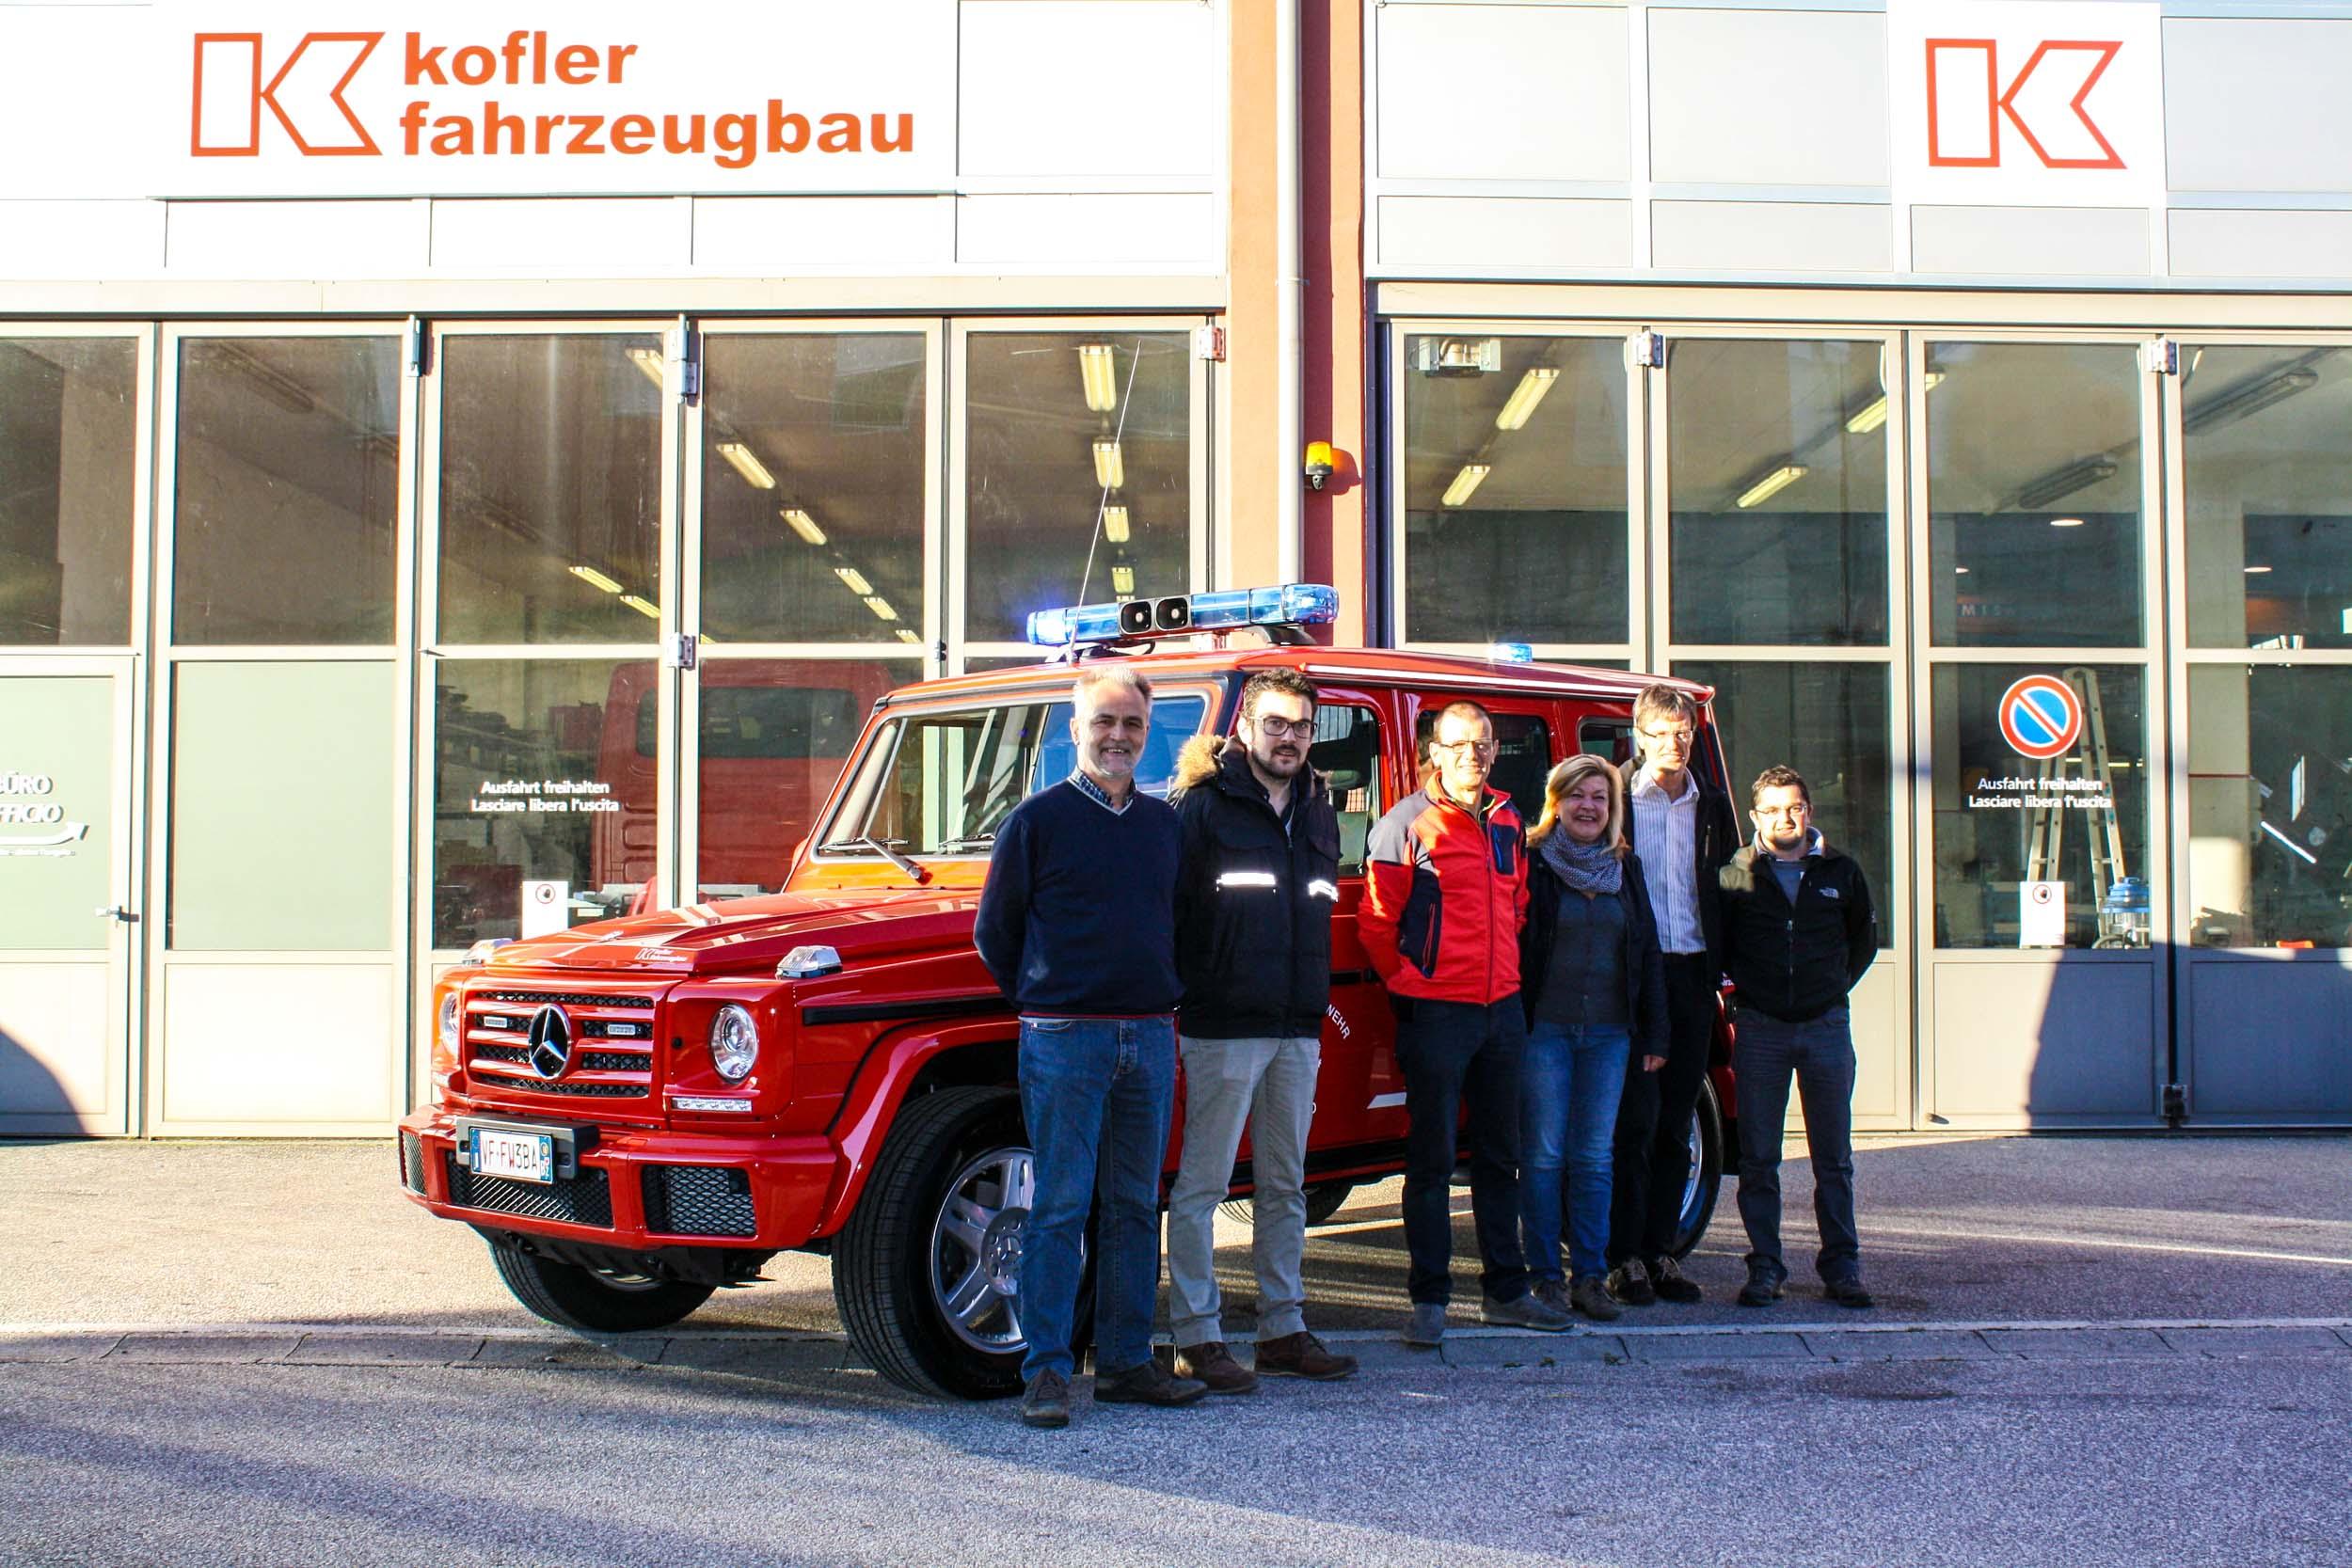 FF-Mühlwald-Kofler-Fahrzeugbau